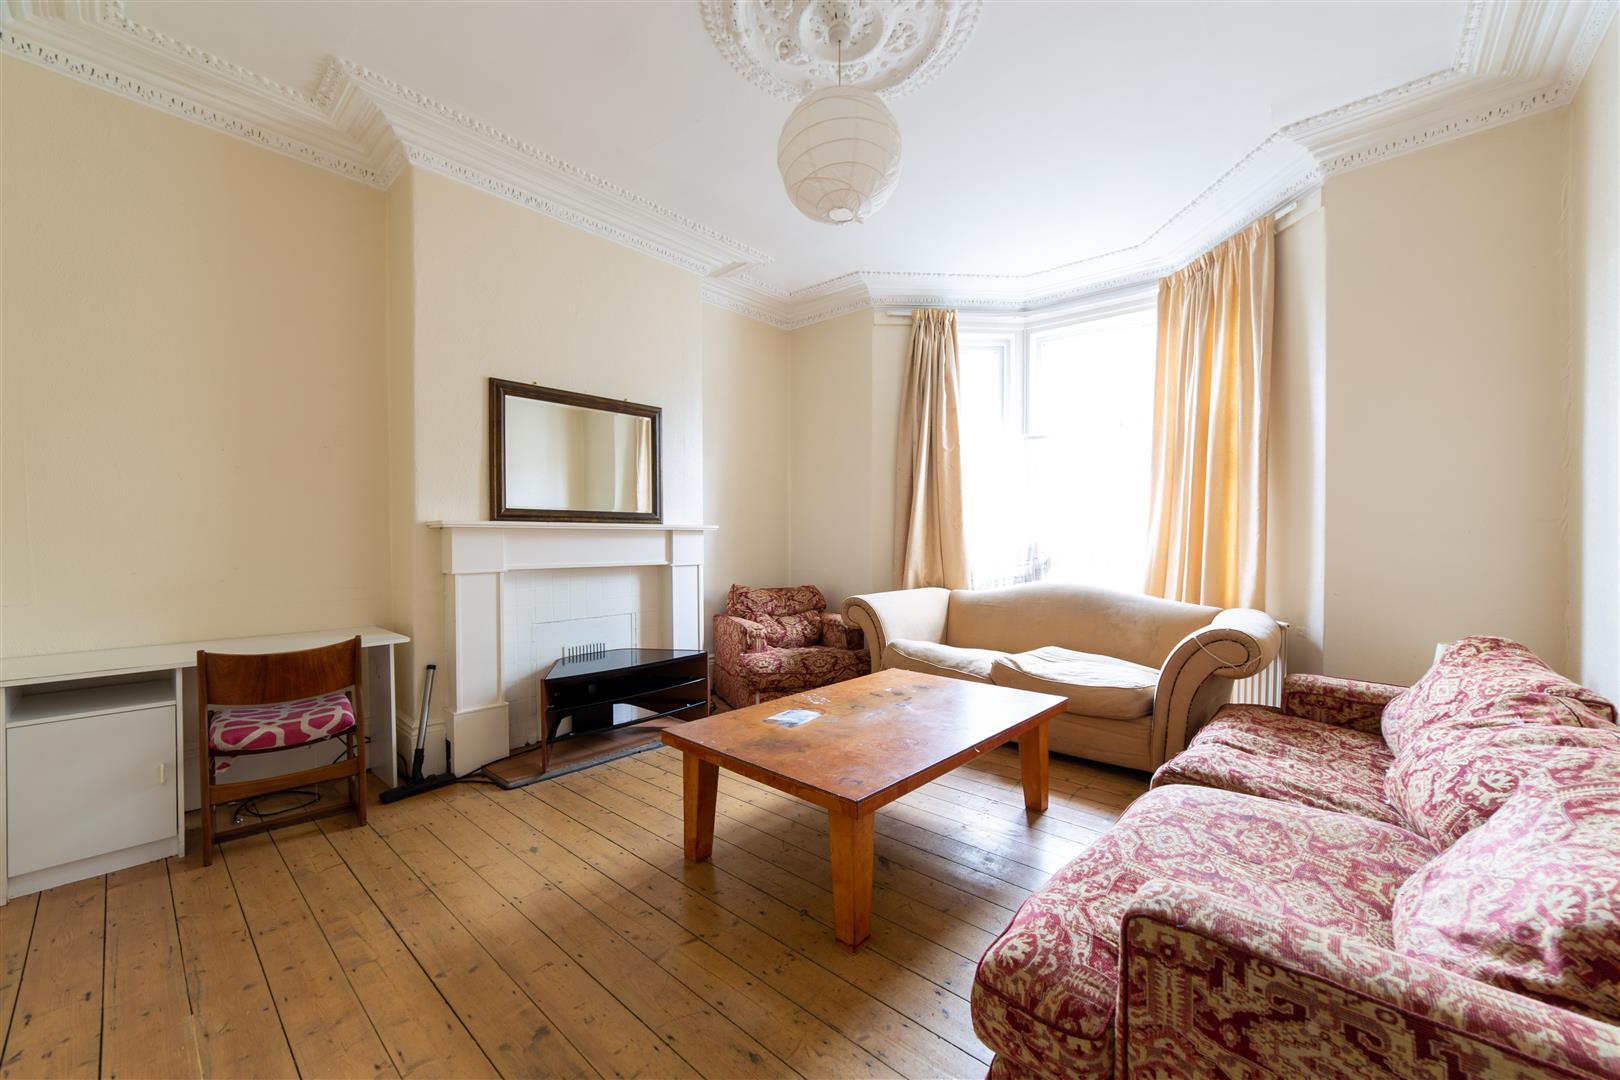 4 bed terraced house to rent in Newcastle Upon Tyne, NE2 3LJ, NE2